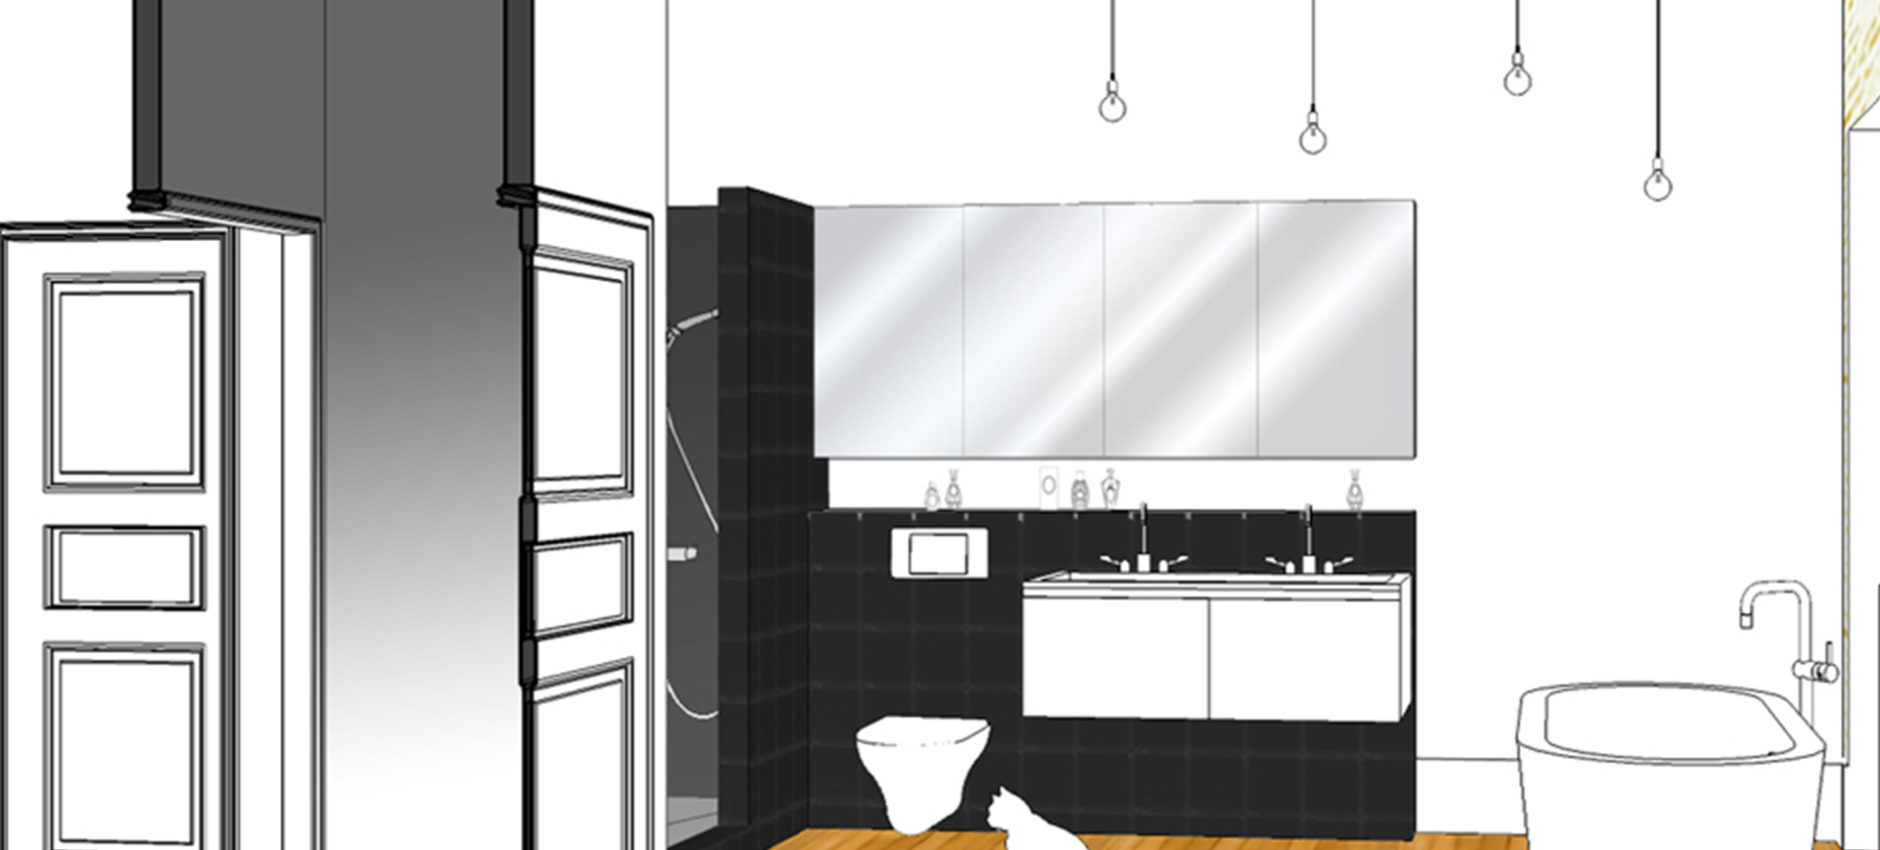 boca_architecture_projet_maison_AG_05.jpg